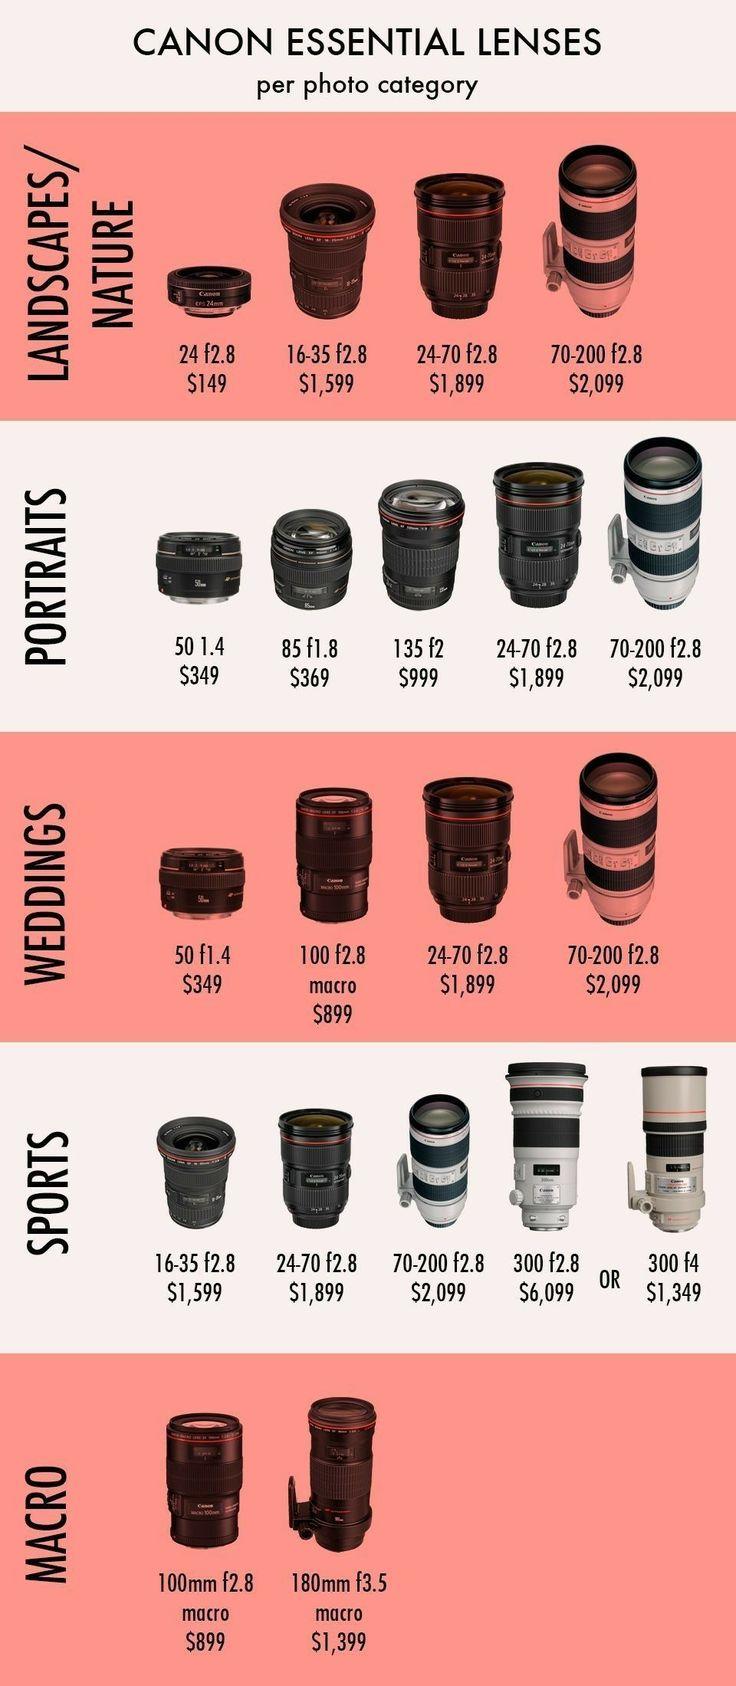 Best Photographic Lenses for Each Specialty #photography101 #lens #cameralenses #photography #cameraequipment #cameraequipmentorganization